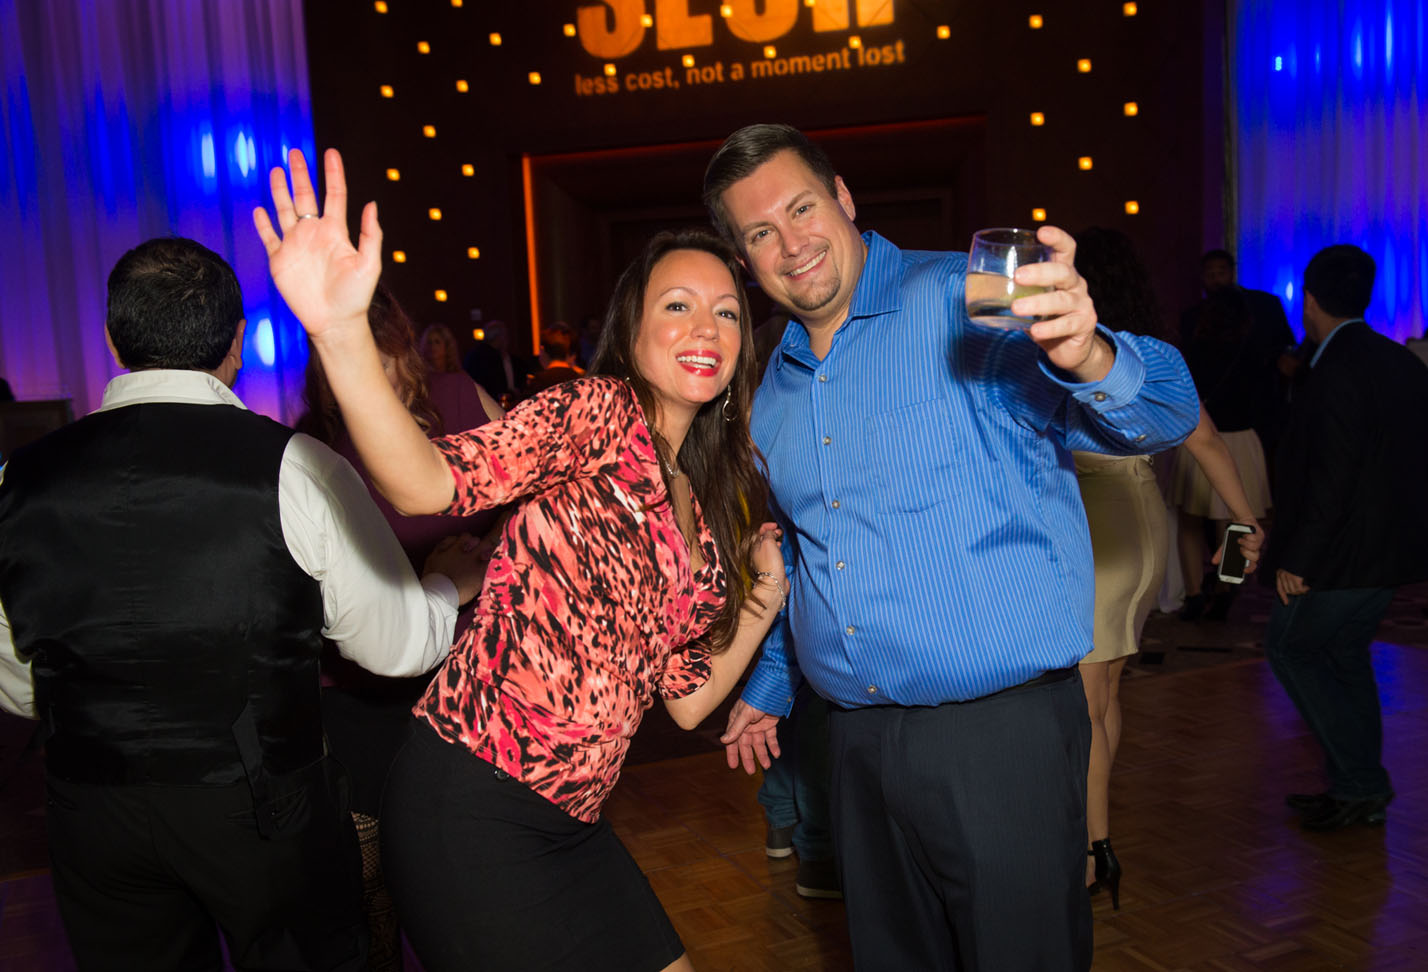 2015-12-09 ReMax Corpoarte Event - The Borgata - Atlantic City NJ - Photo Sesh - 2015-5292.jpg